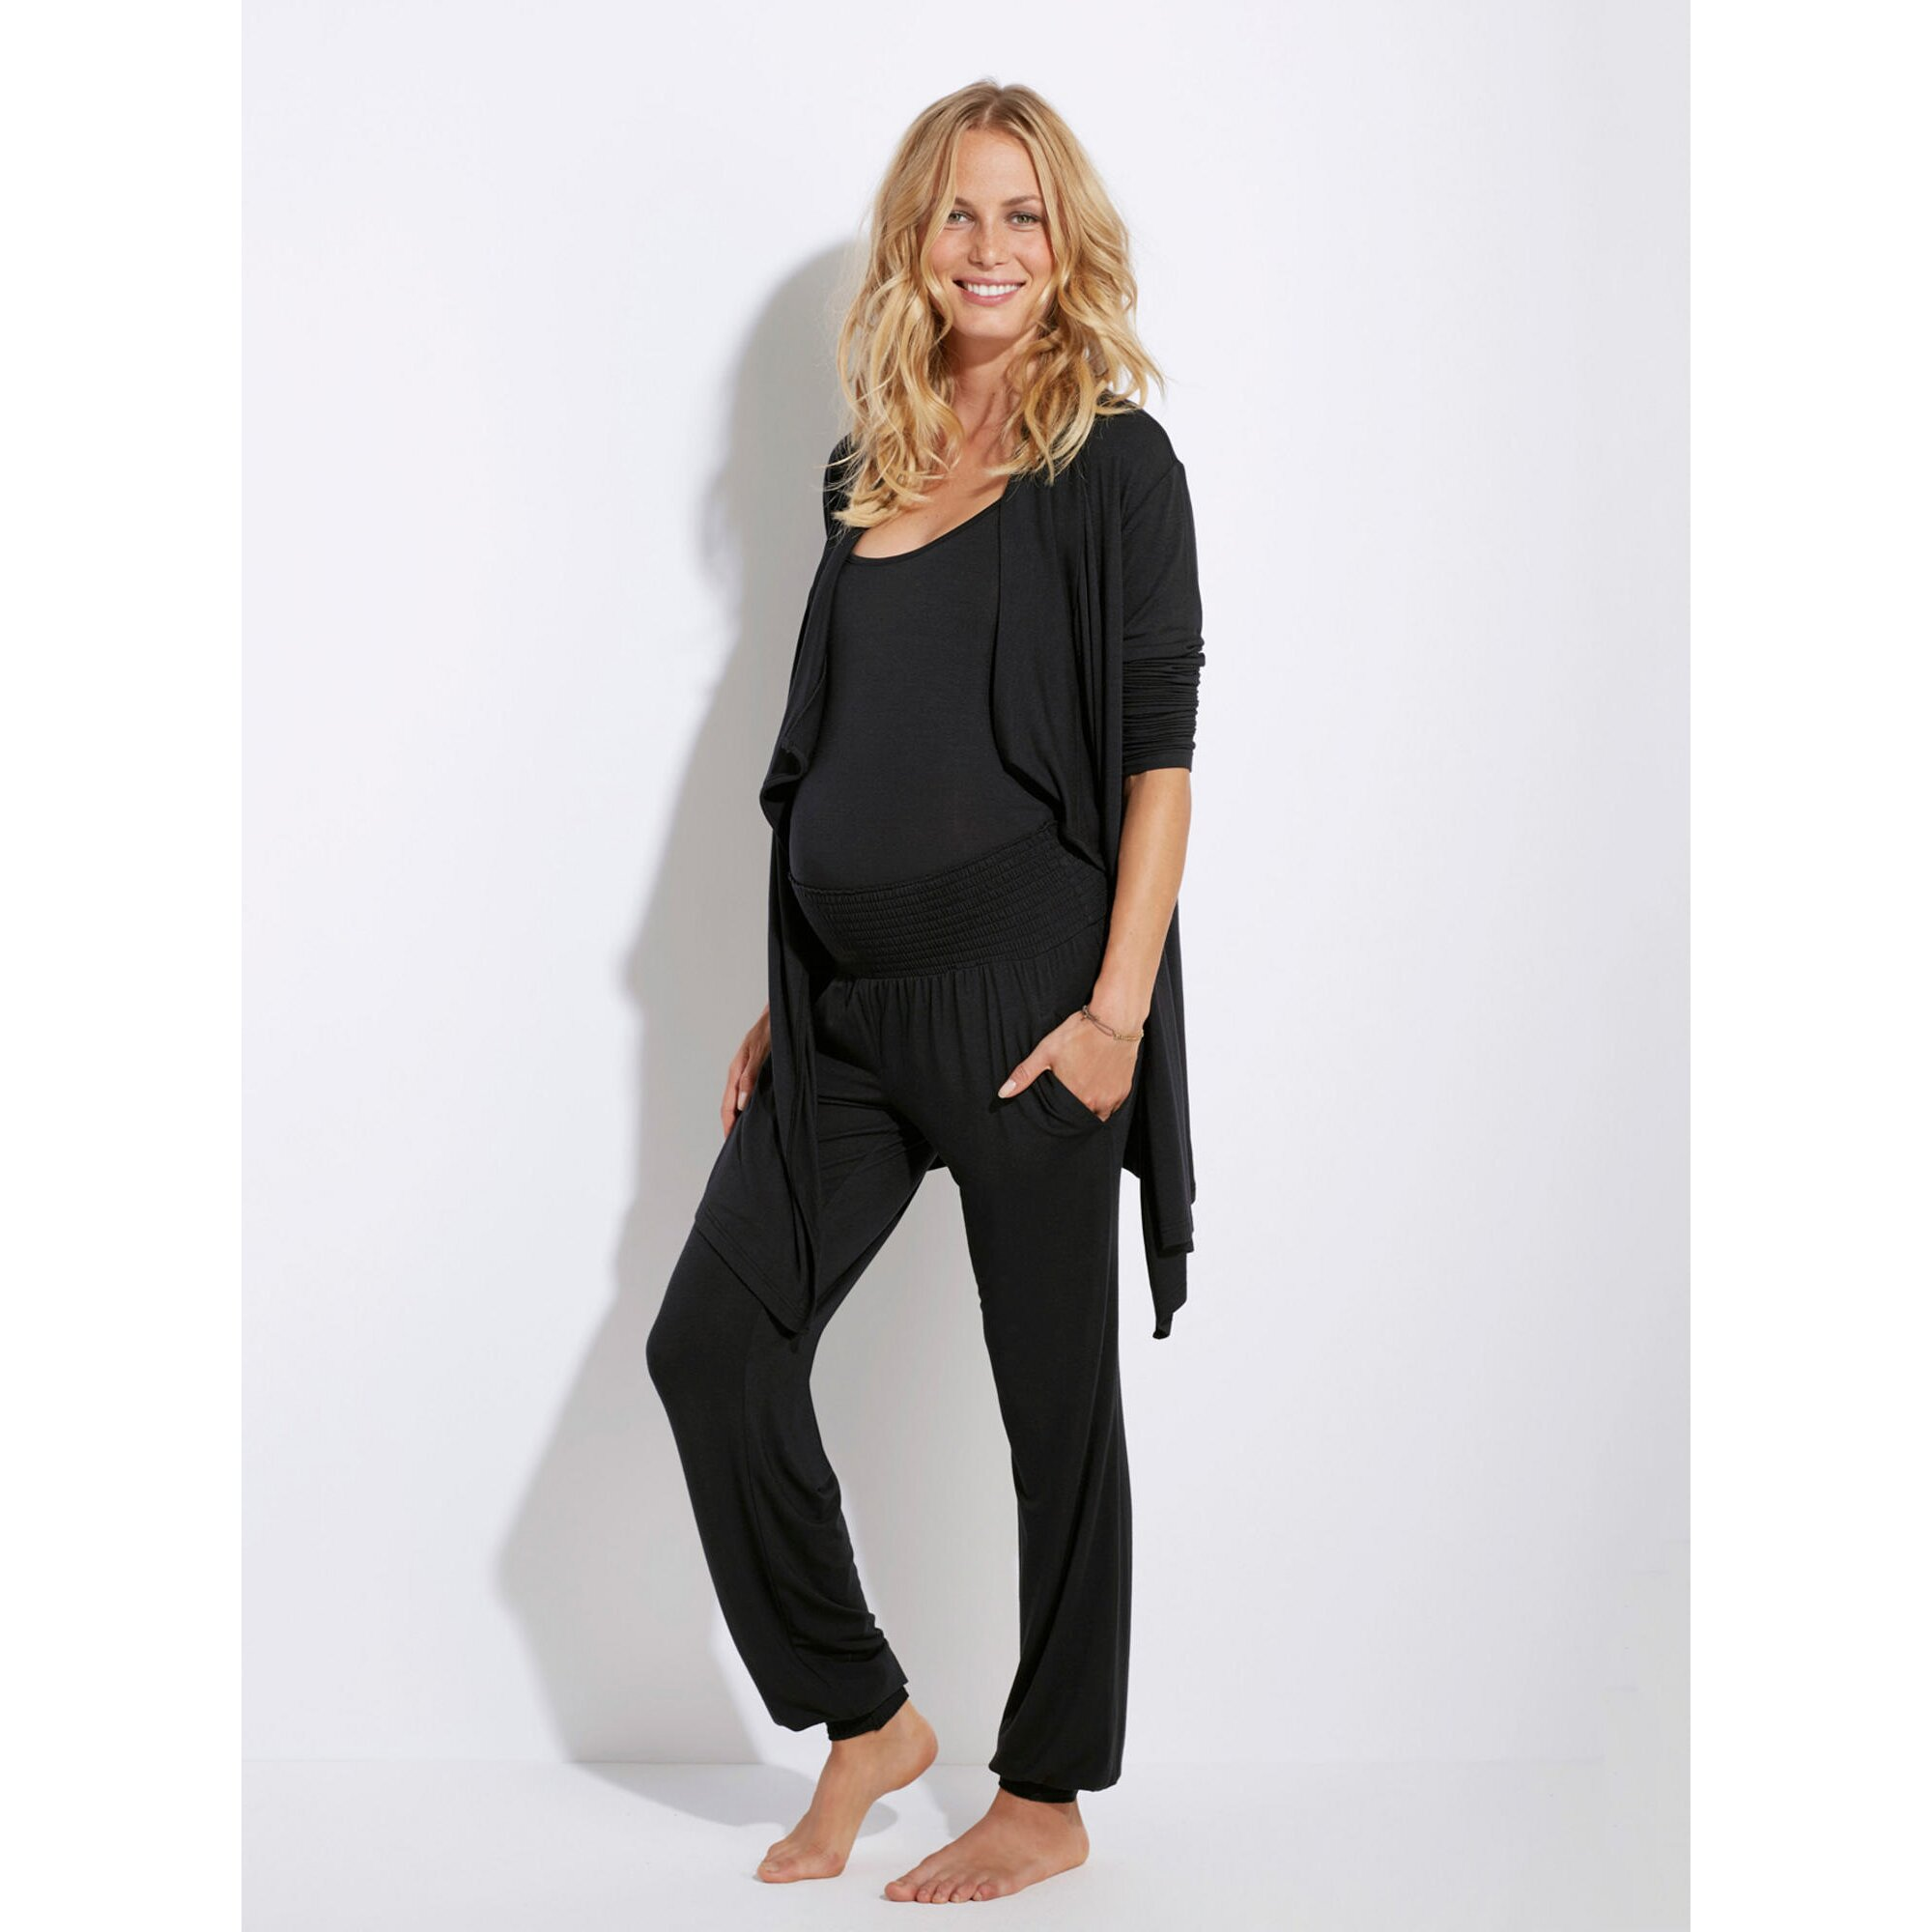 vertbaudet-homewear-set-schwangerschaft-und-stillzeit, 49.99 EUR @ babywalz-de